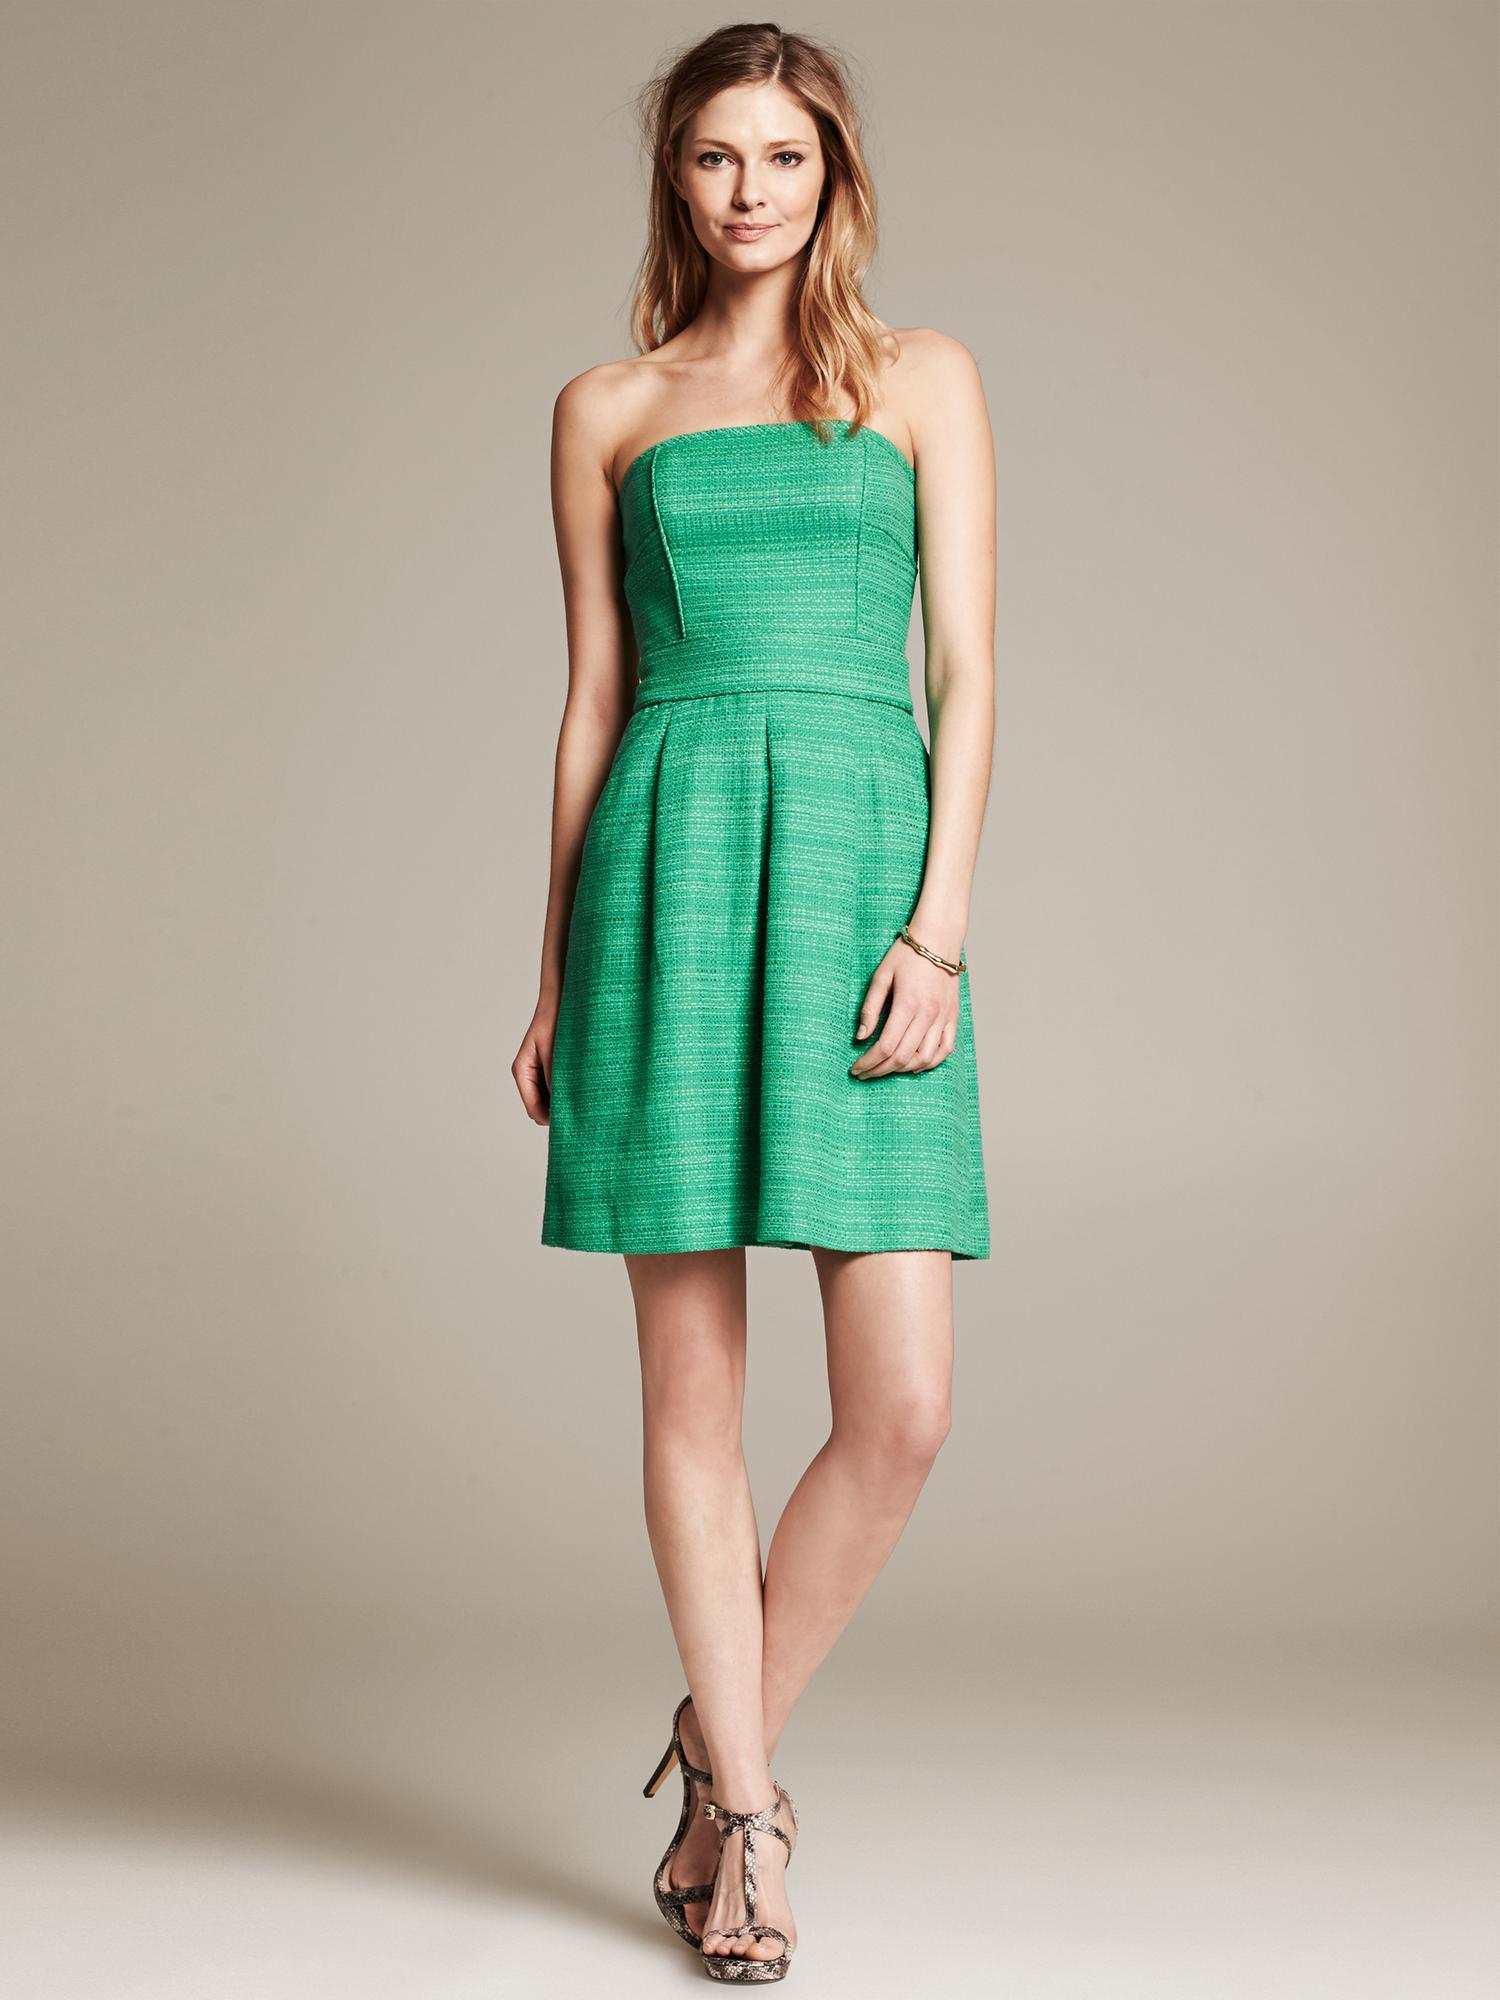 emerald green strapless dress « Bella Forte Glass Studio